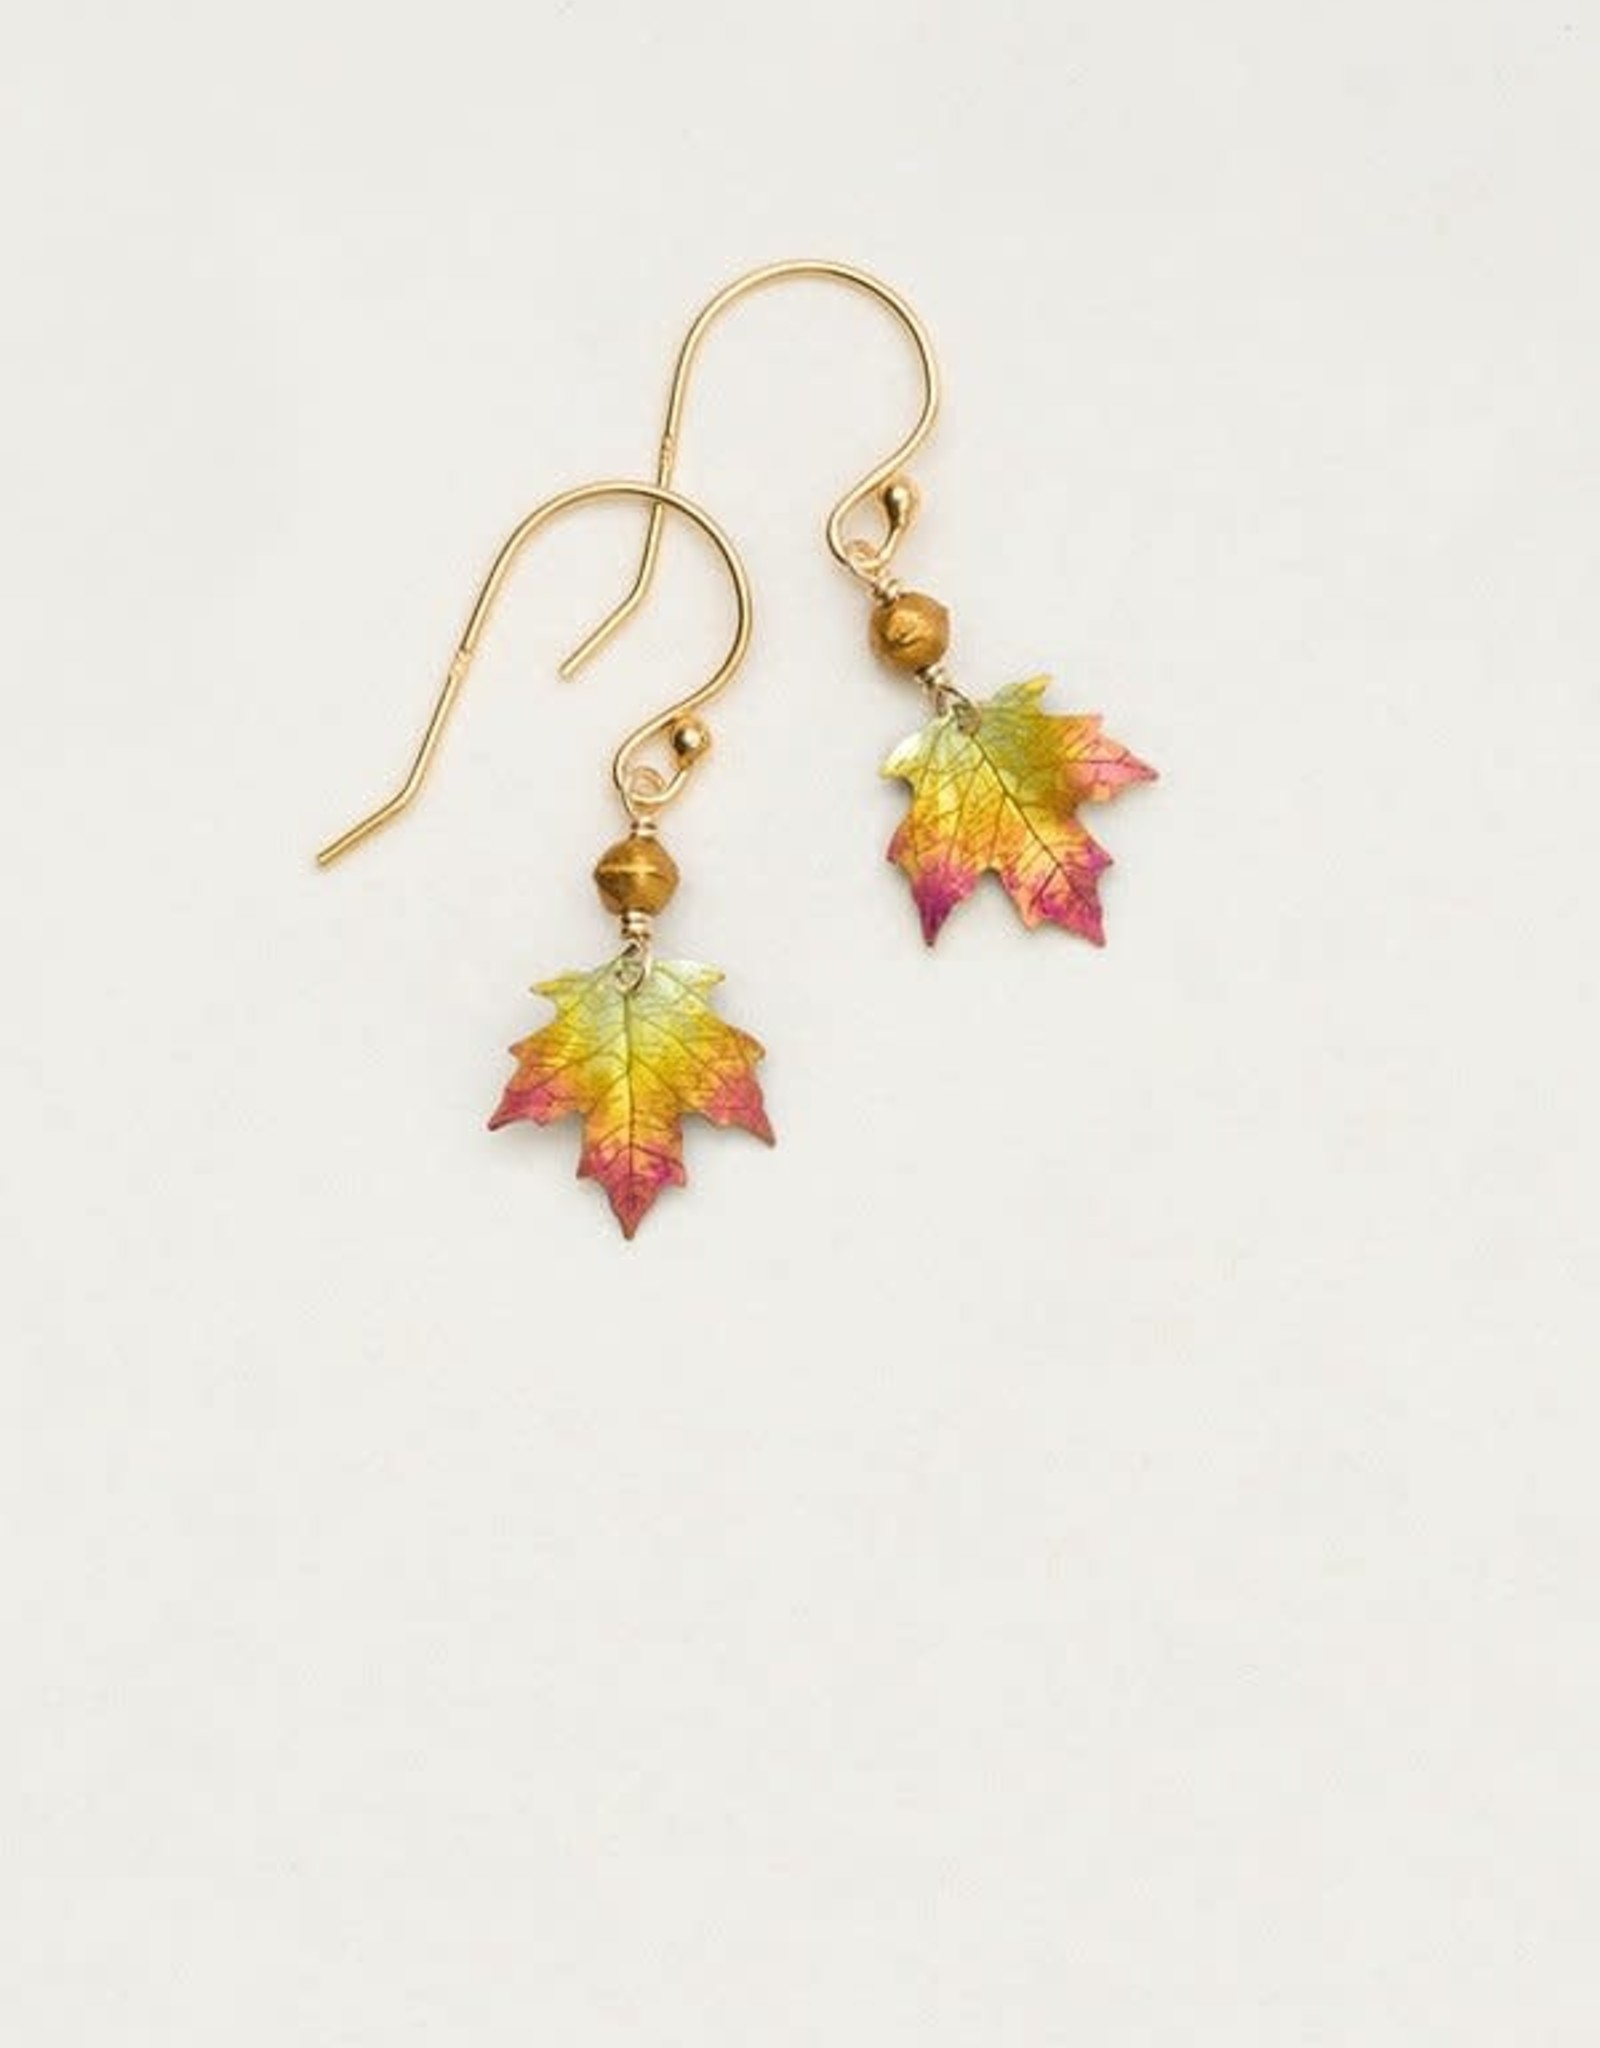 Holly Yashi Peach Petite Sugar Maple Earrings